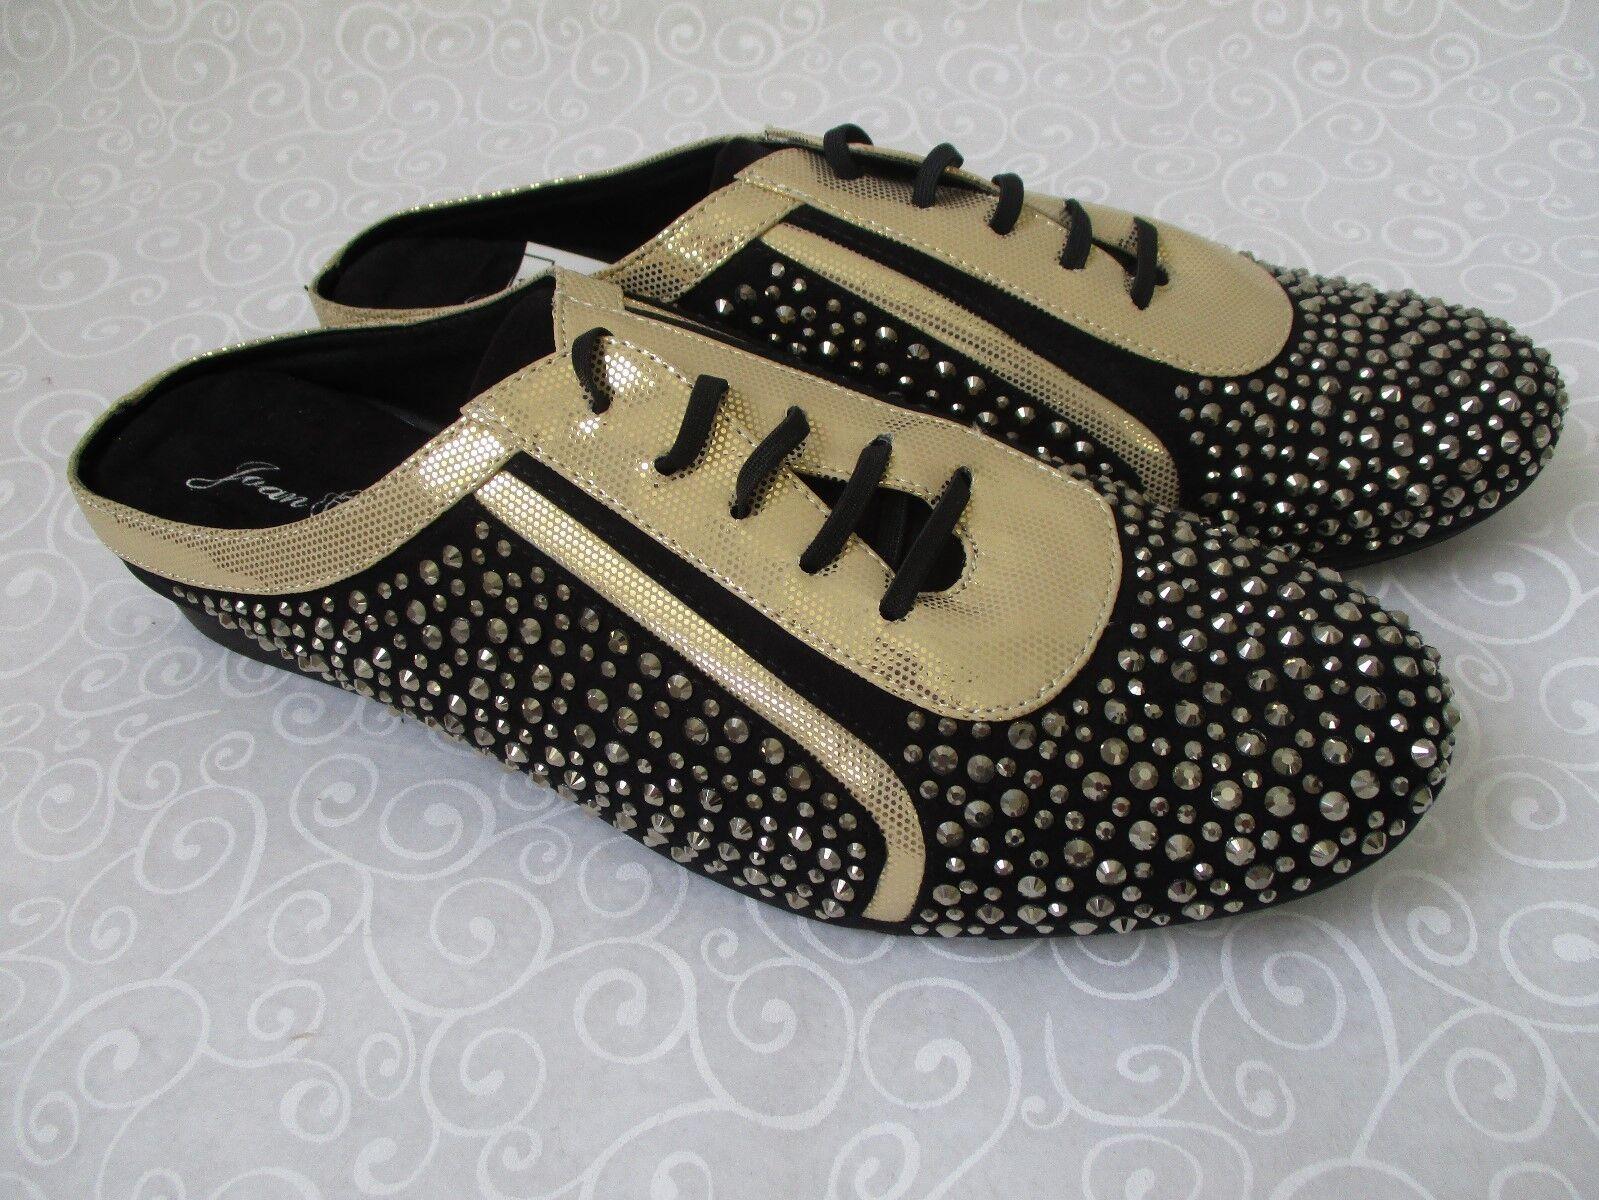 JOAN BOYCE BLACK & GOLD RHINESTONE BEADED Schuhe SIZE 9 1/2 M - NEU